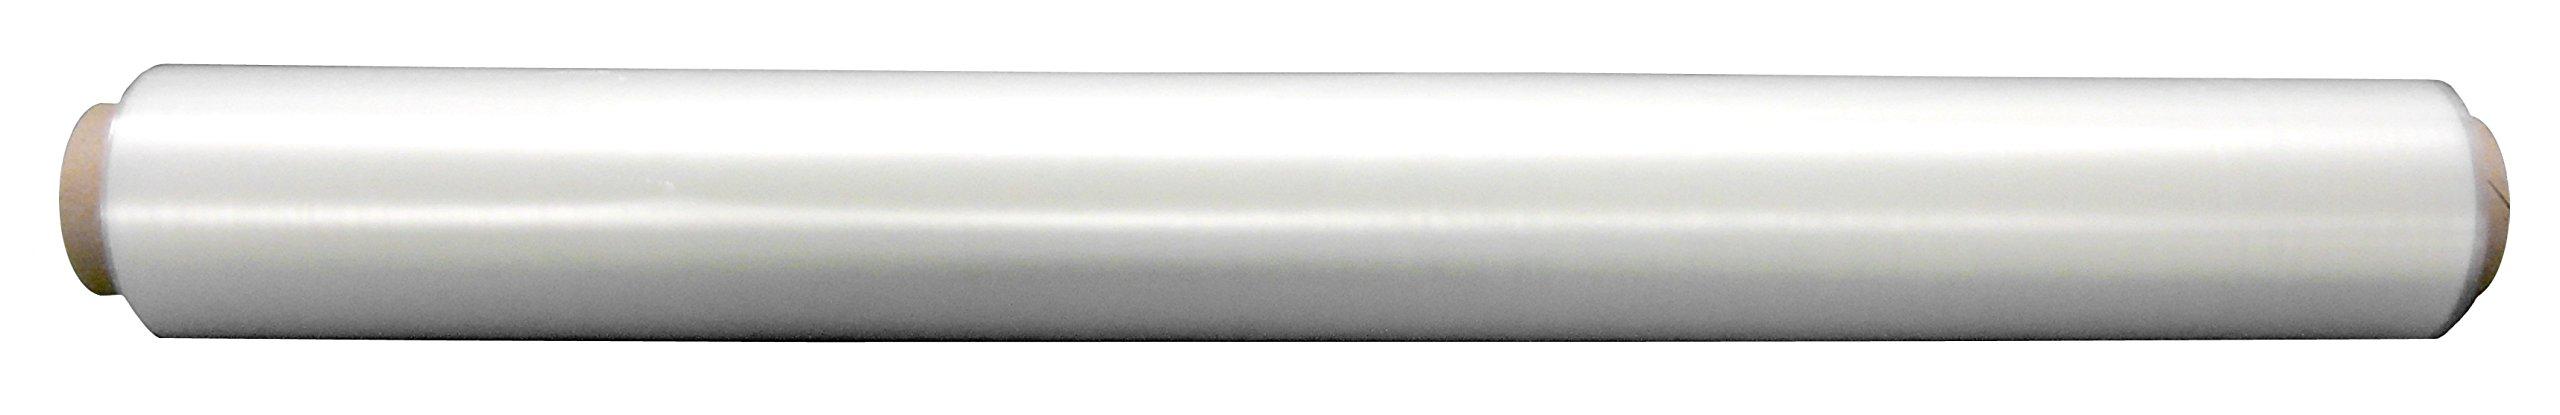 Polymount Dry Film 40.5''x90'